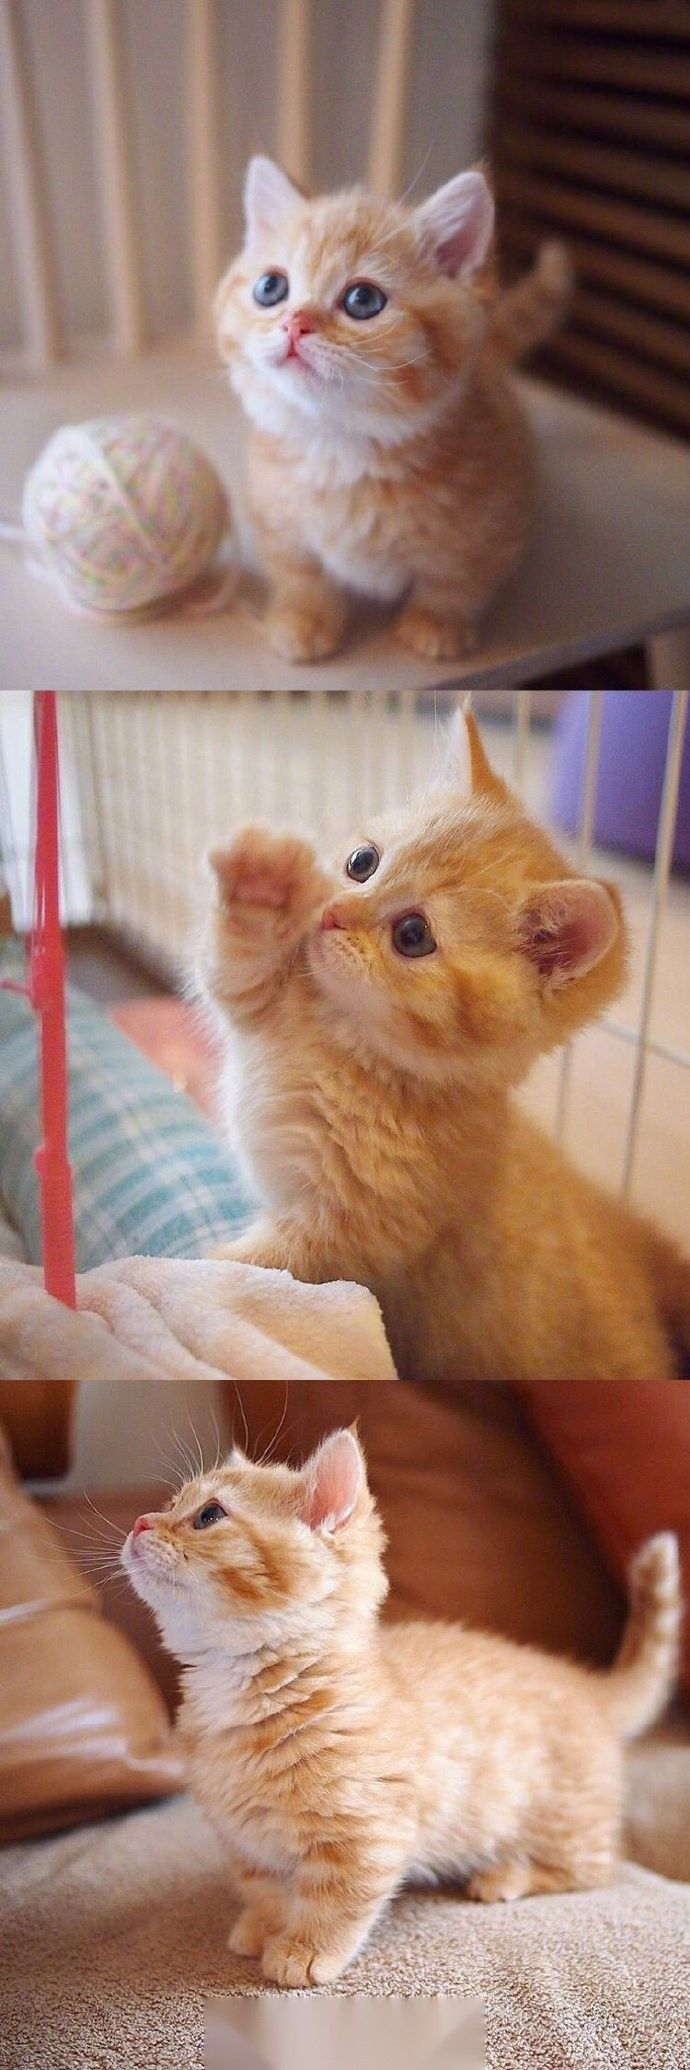 Cutebabyanimalskittens Kittens Cutest Cute Cats Cute Baby Animals